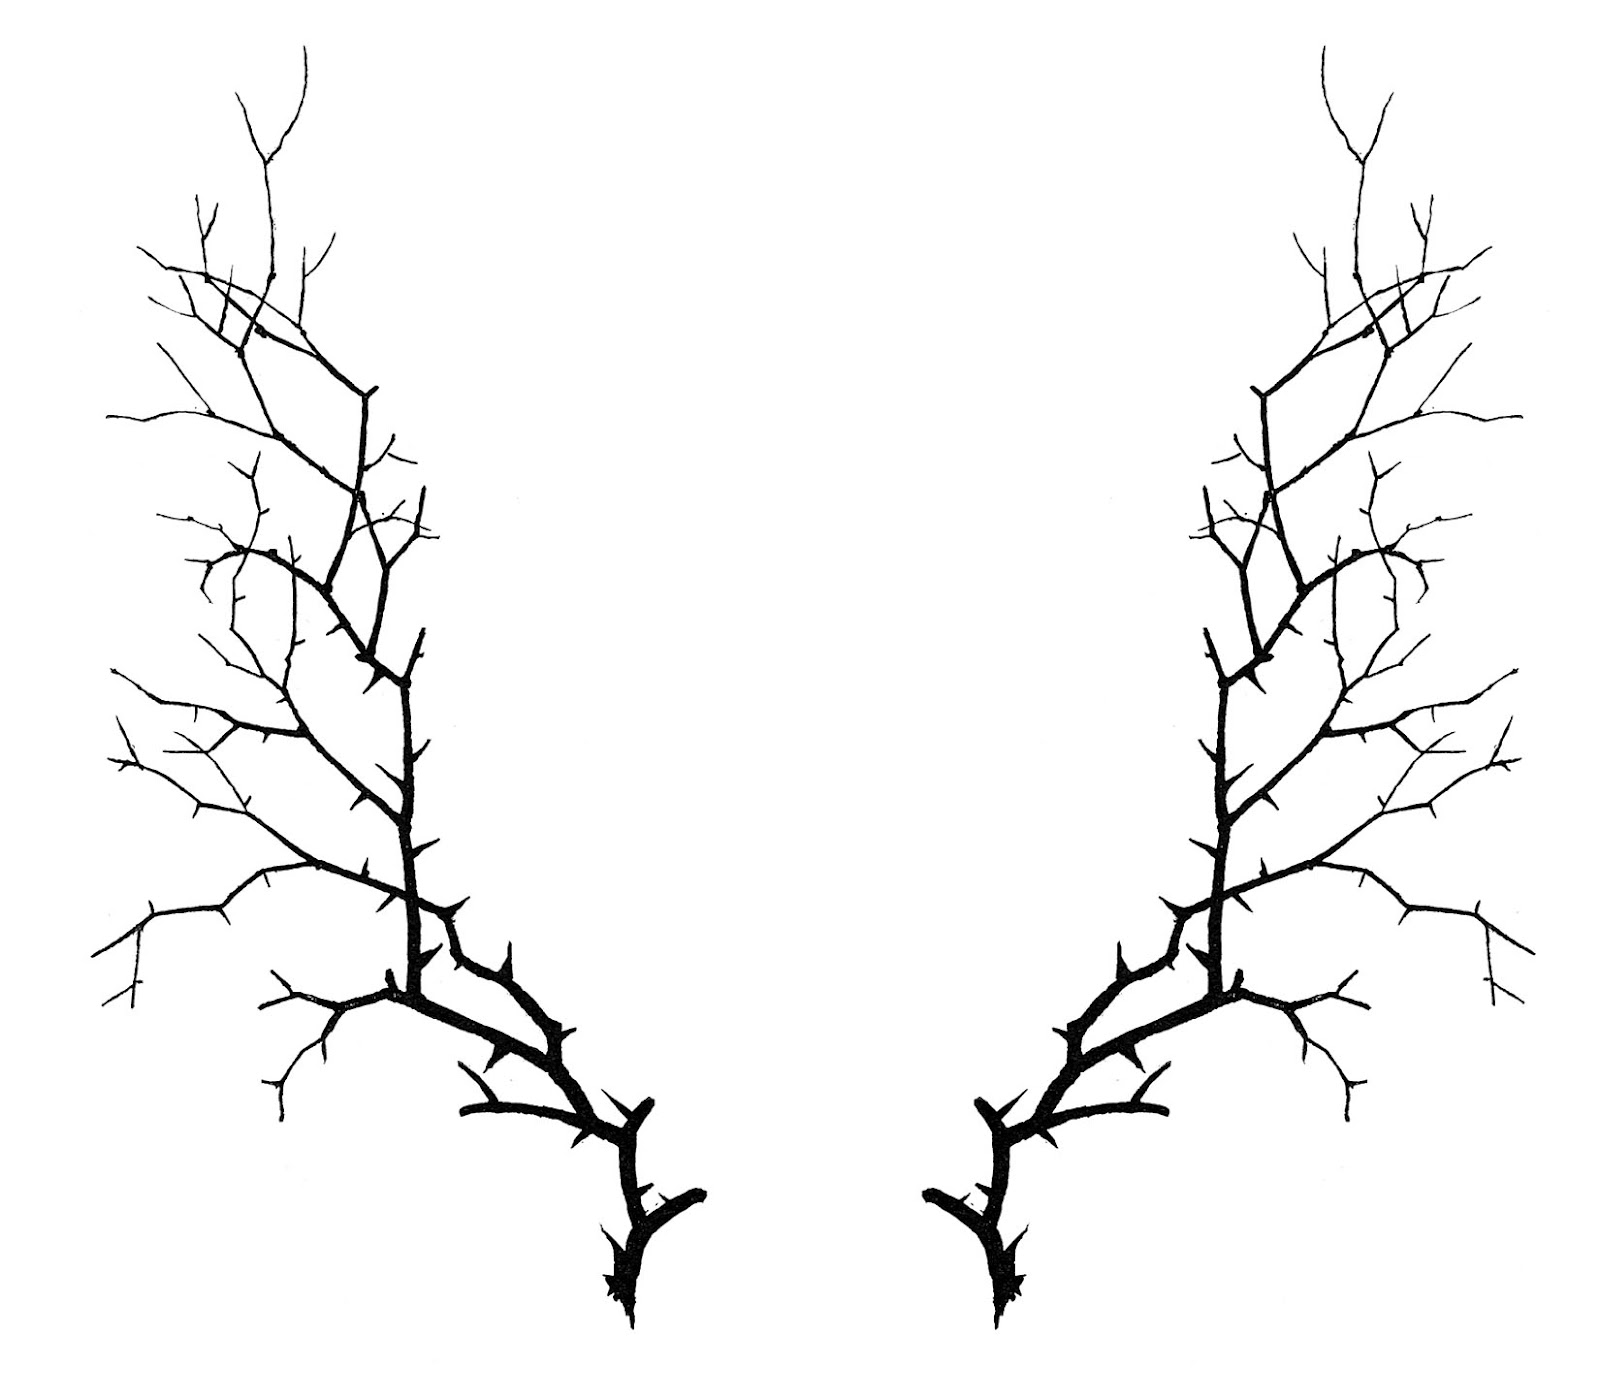 Twig border clipart silhouette.